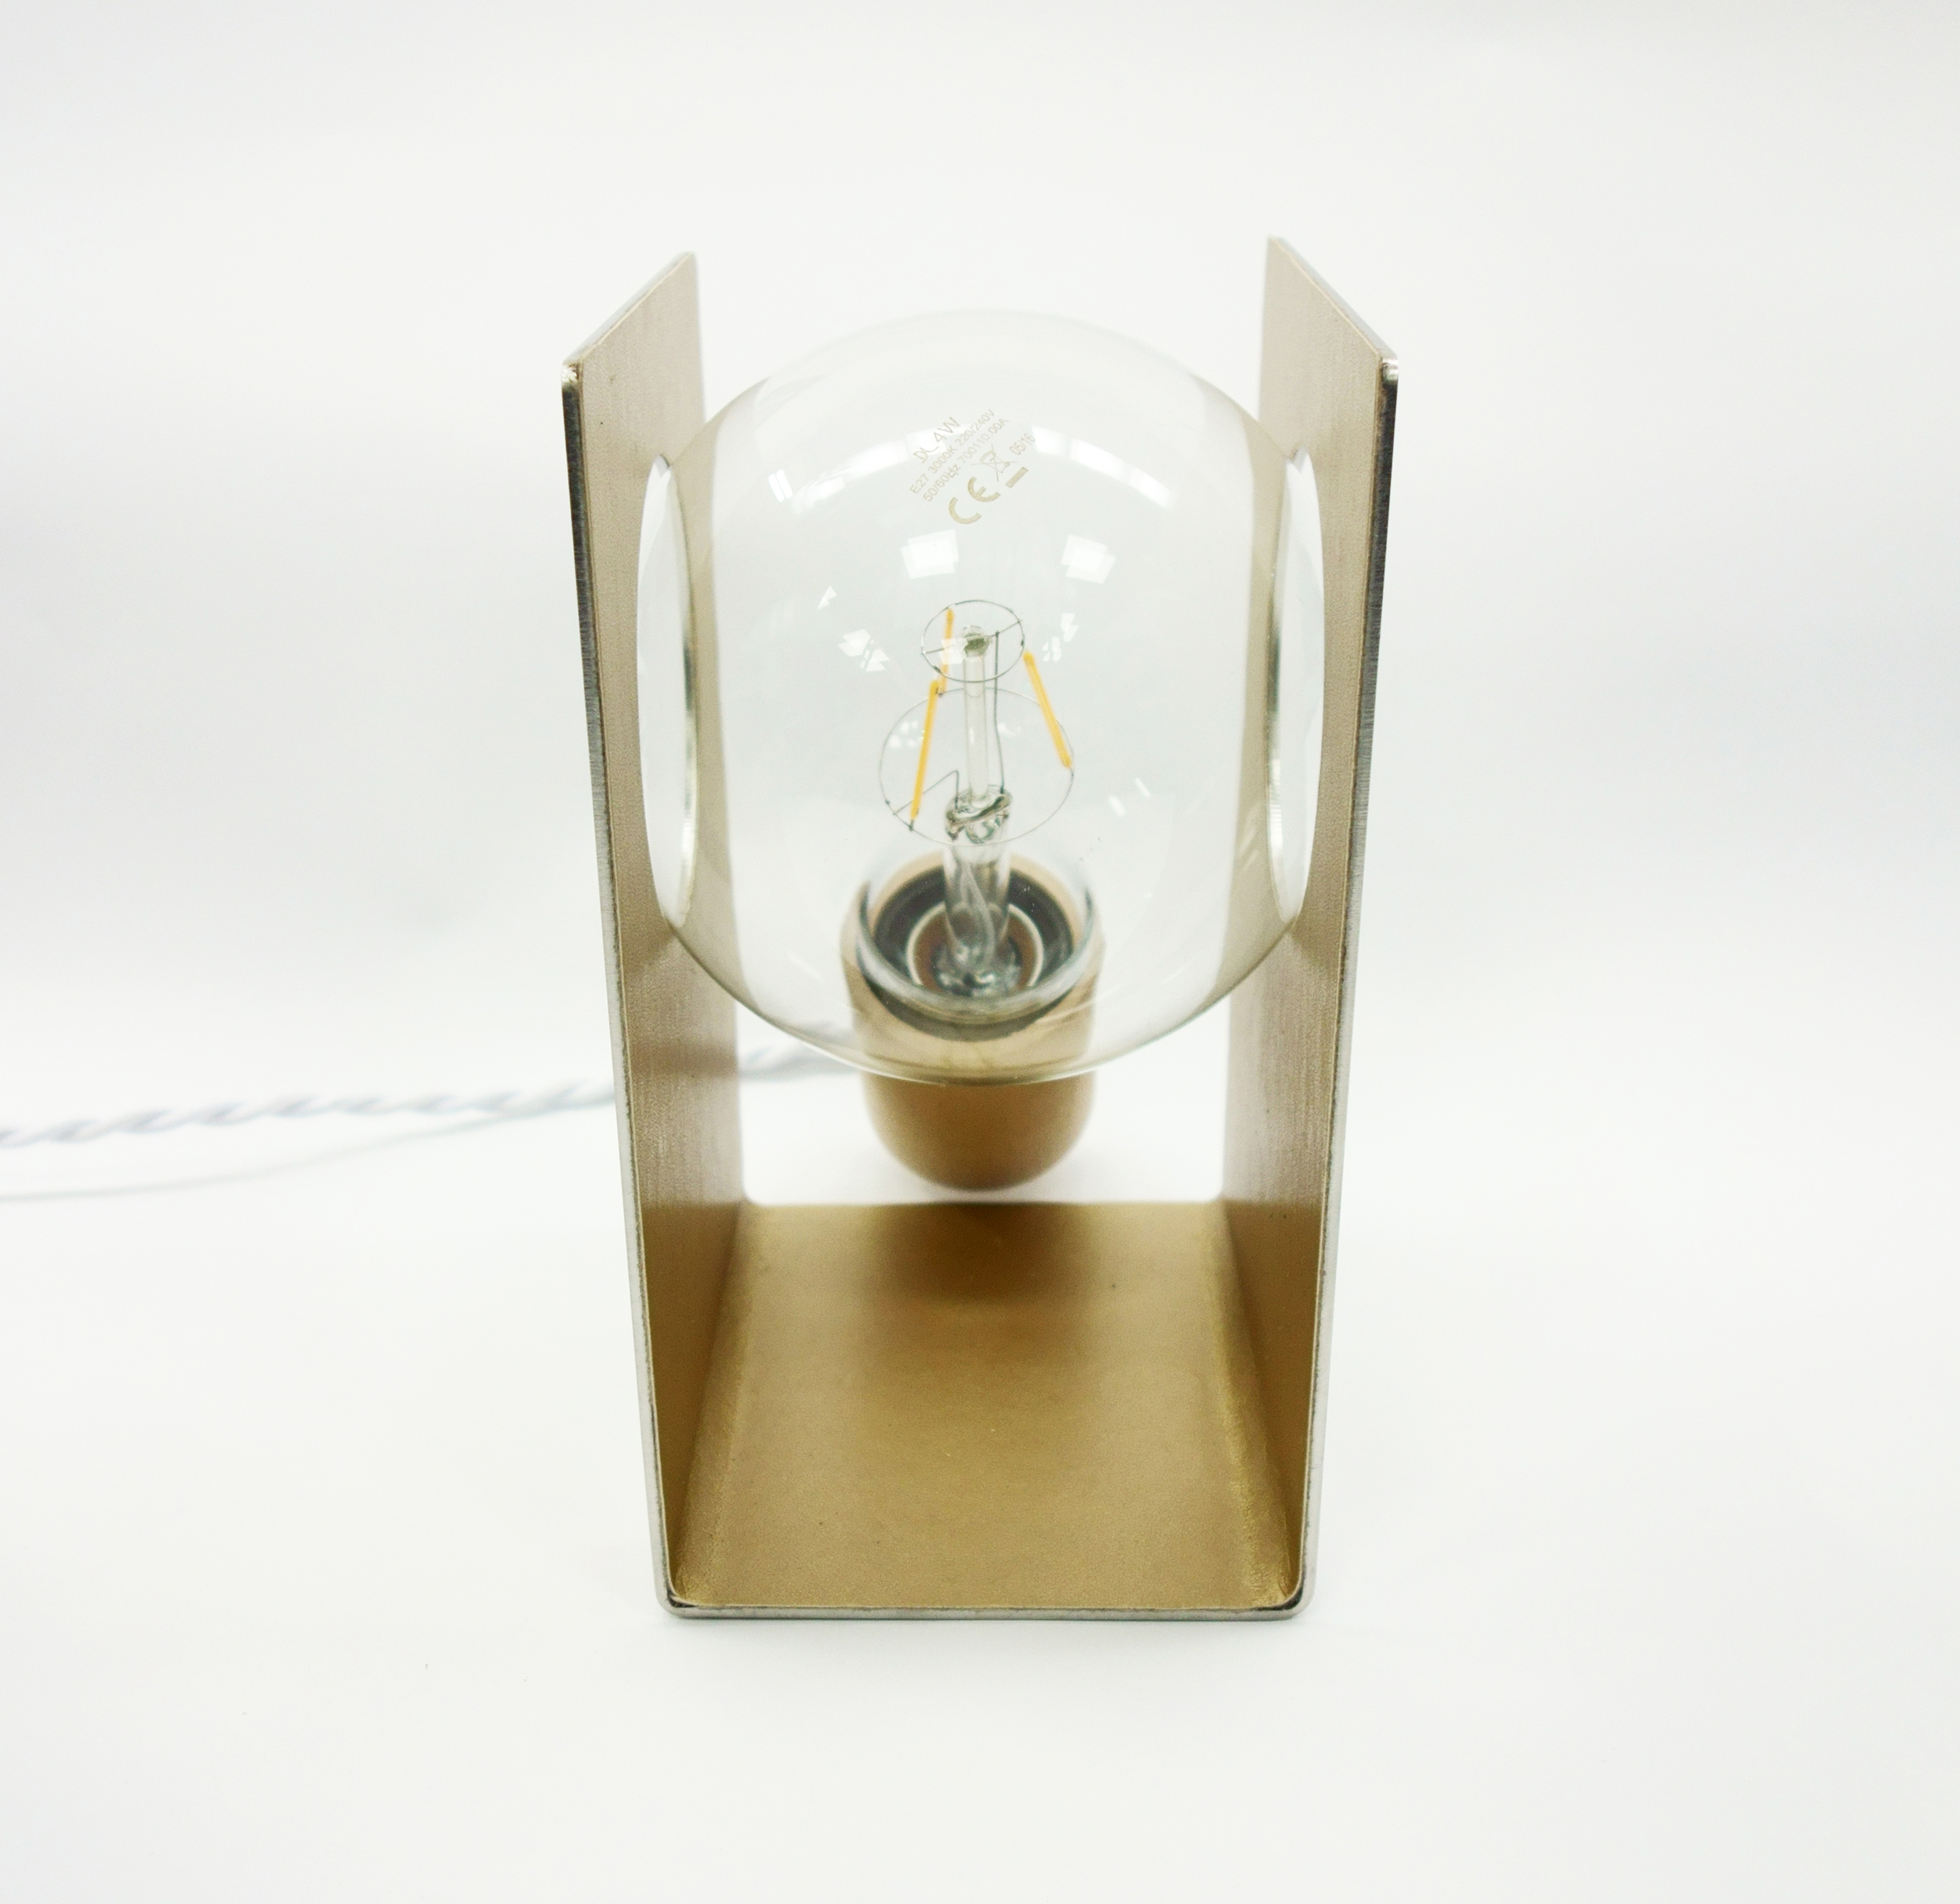 Altair Lamp by Leonardo Criolani